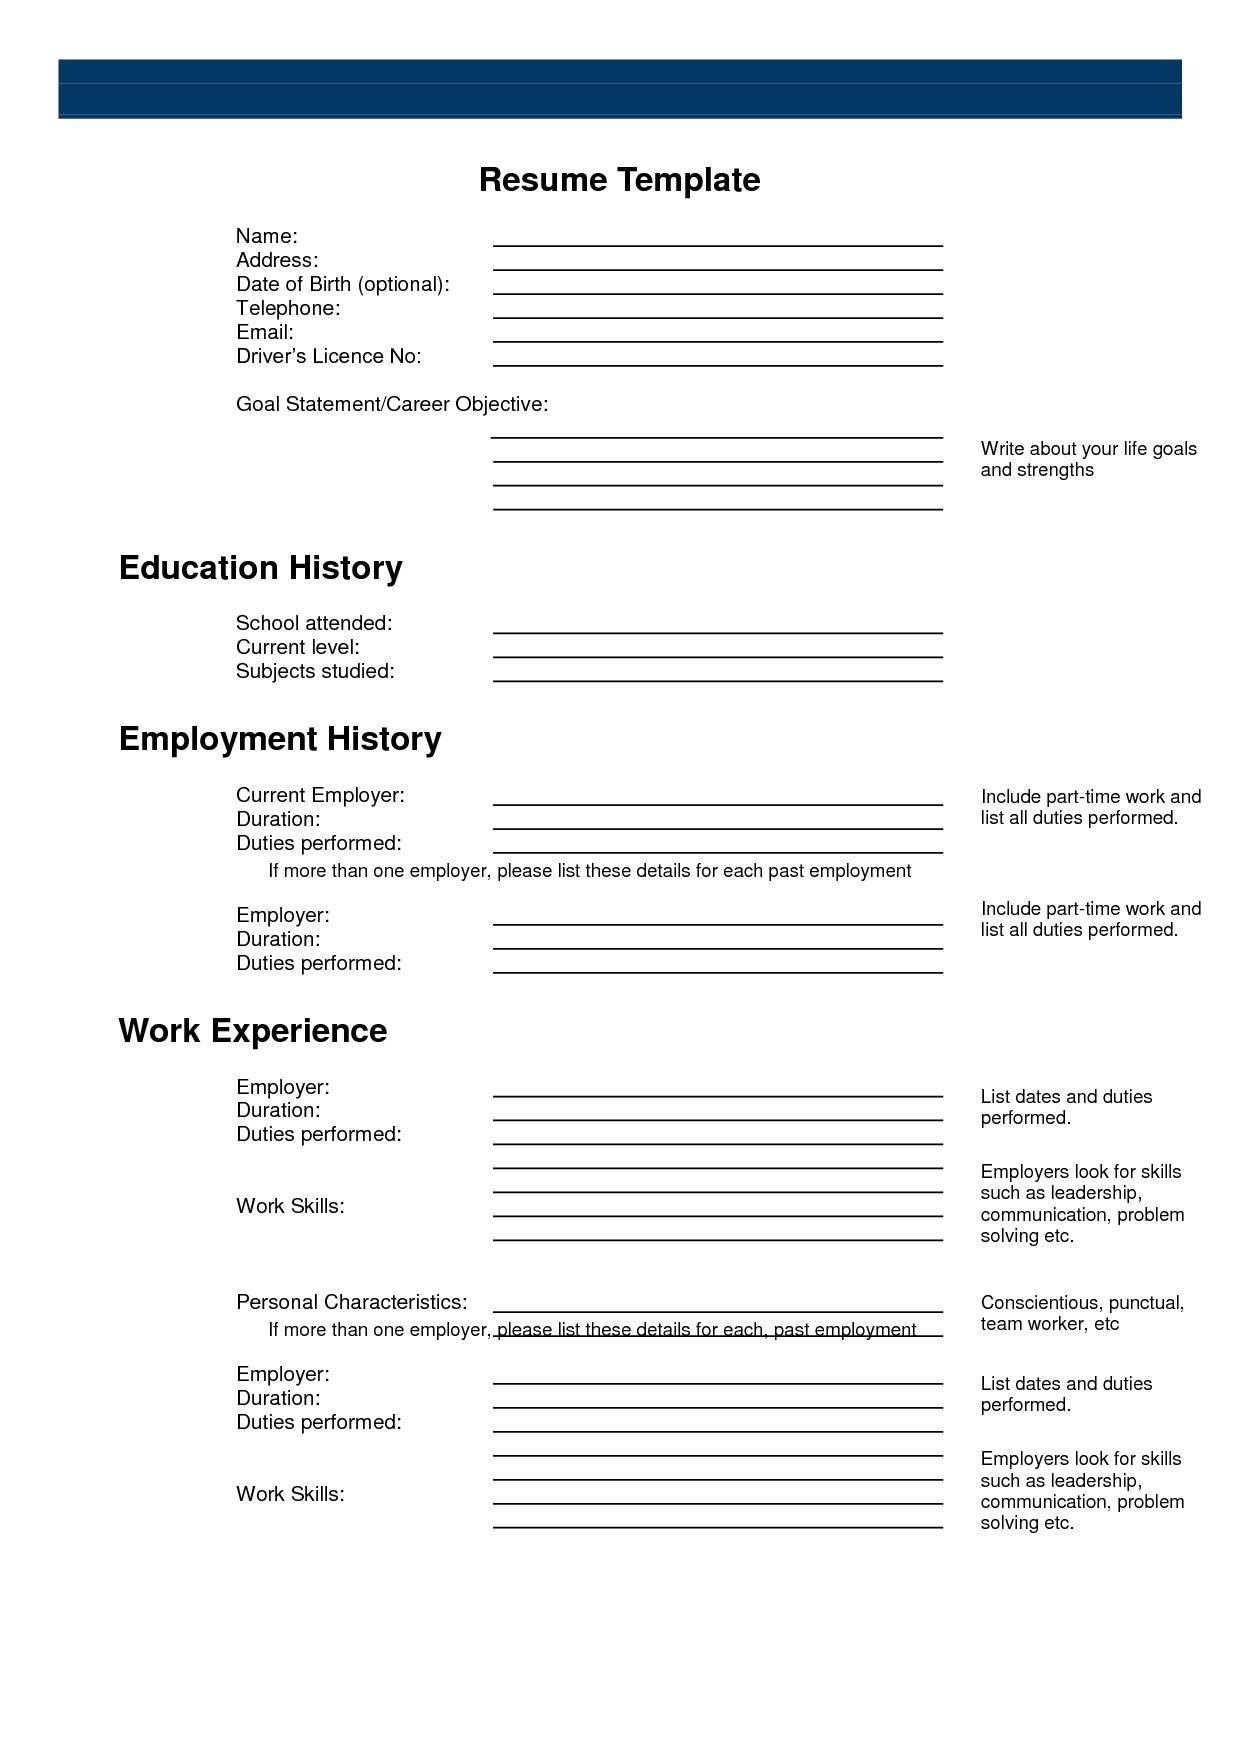 Free Printable Resume Builder Templates – Thatretailchick - Free Printable Resume Builder